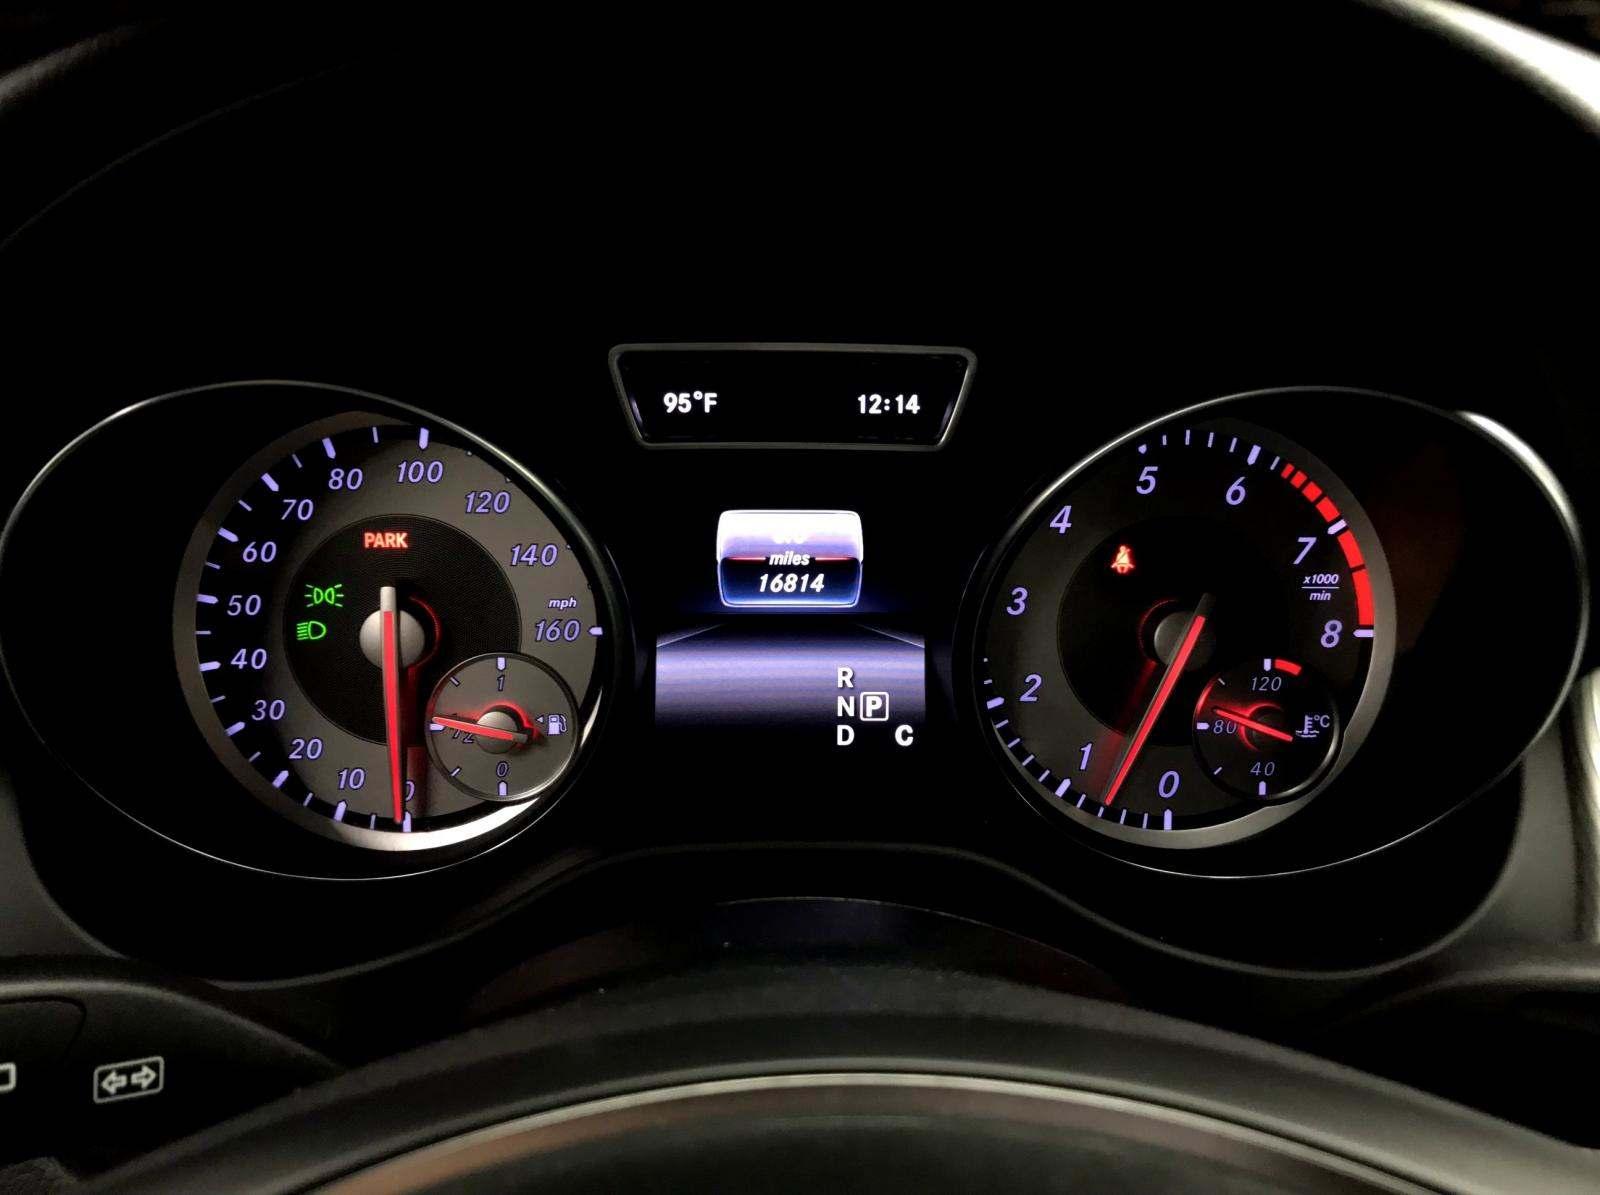 used Mercedes-Benz GLA-Class 2016 vin: WDCTG4EB5GJ206990